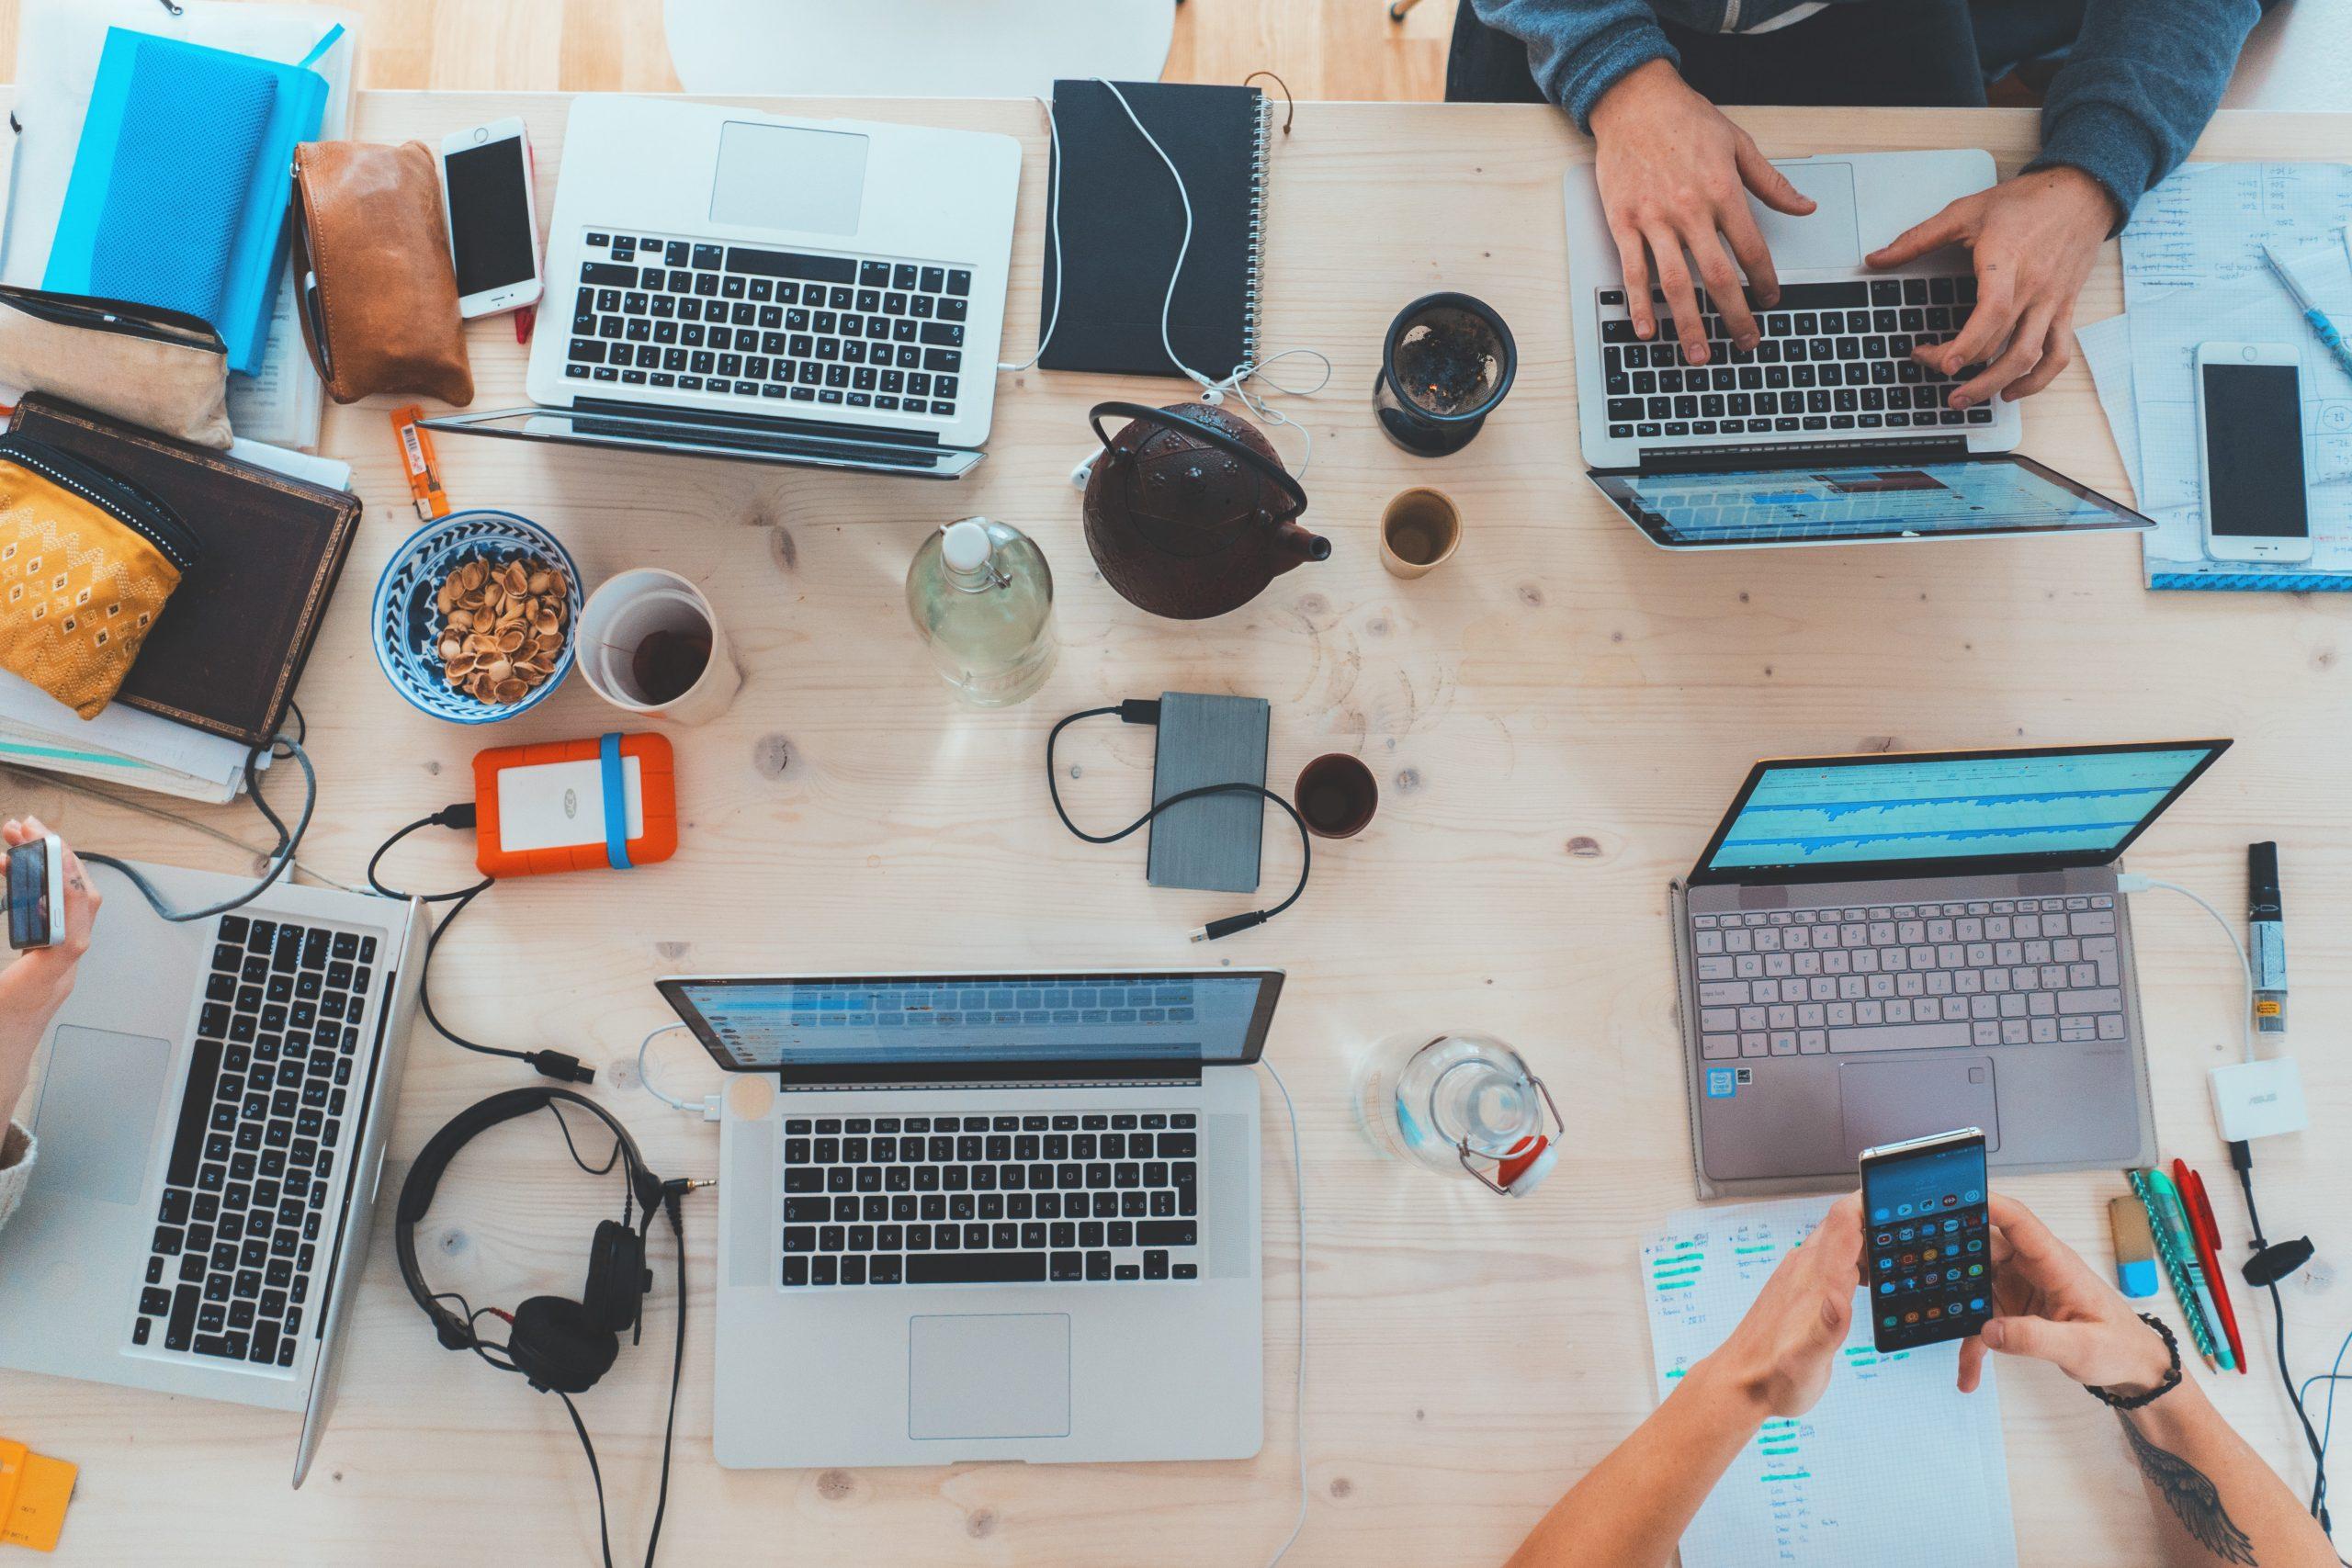 SCS | Remote Learning & Digital Instruction Update